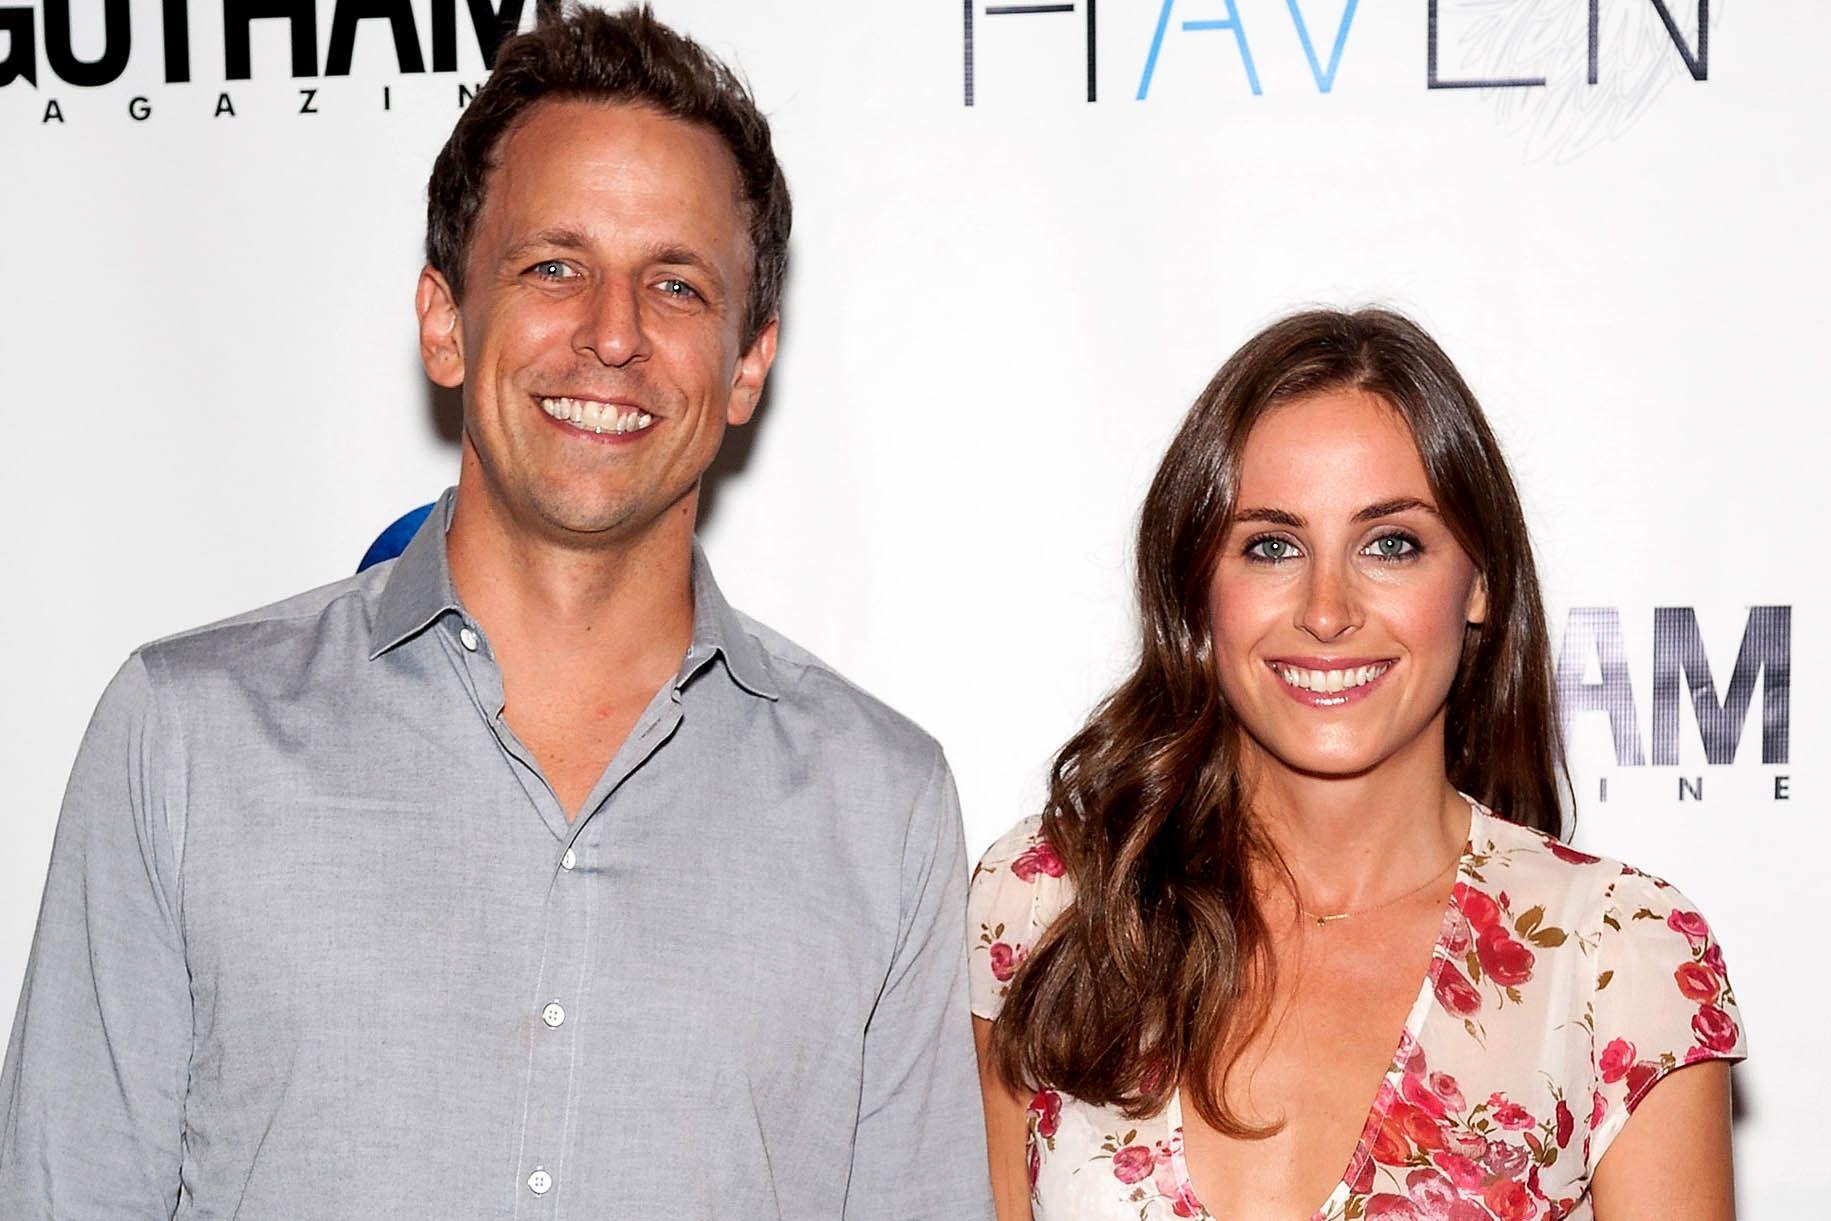 Seth Meyers And Wife Alexi Ashe Have Mega Watt Smiles